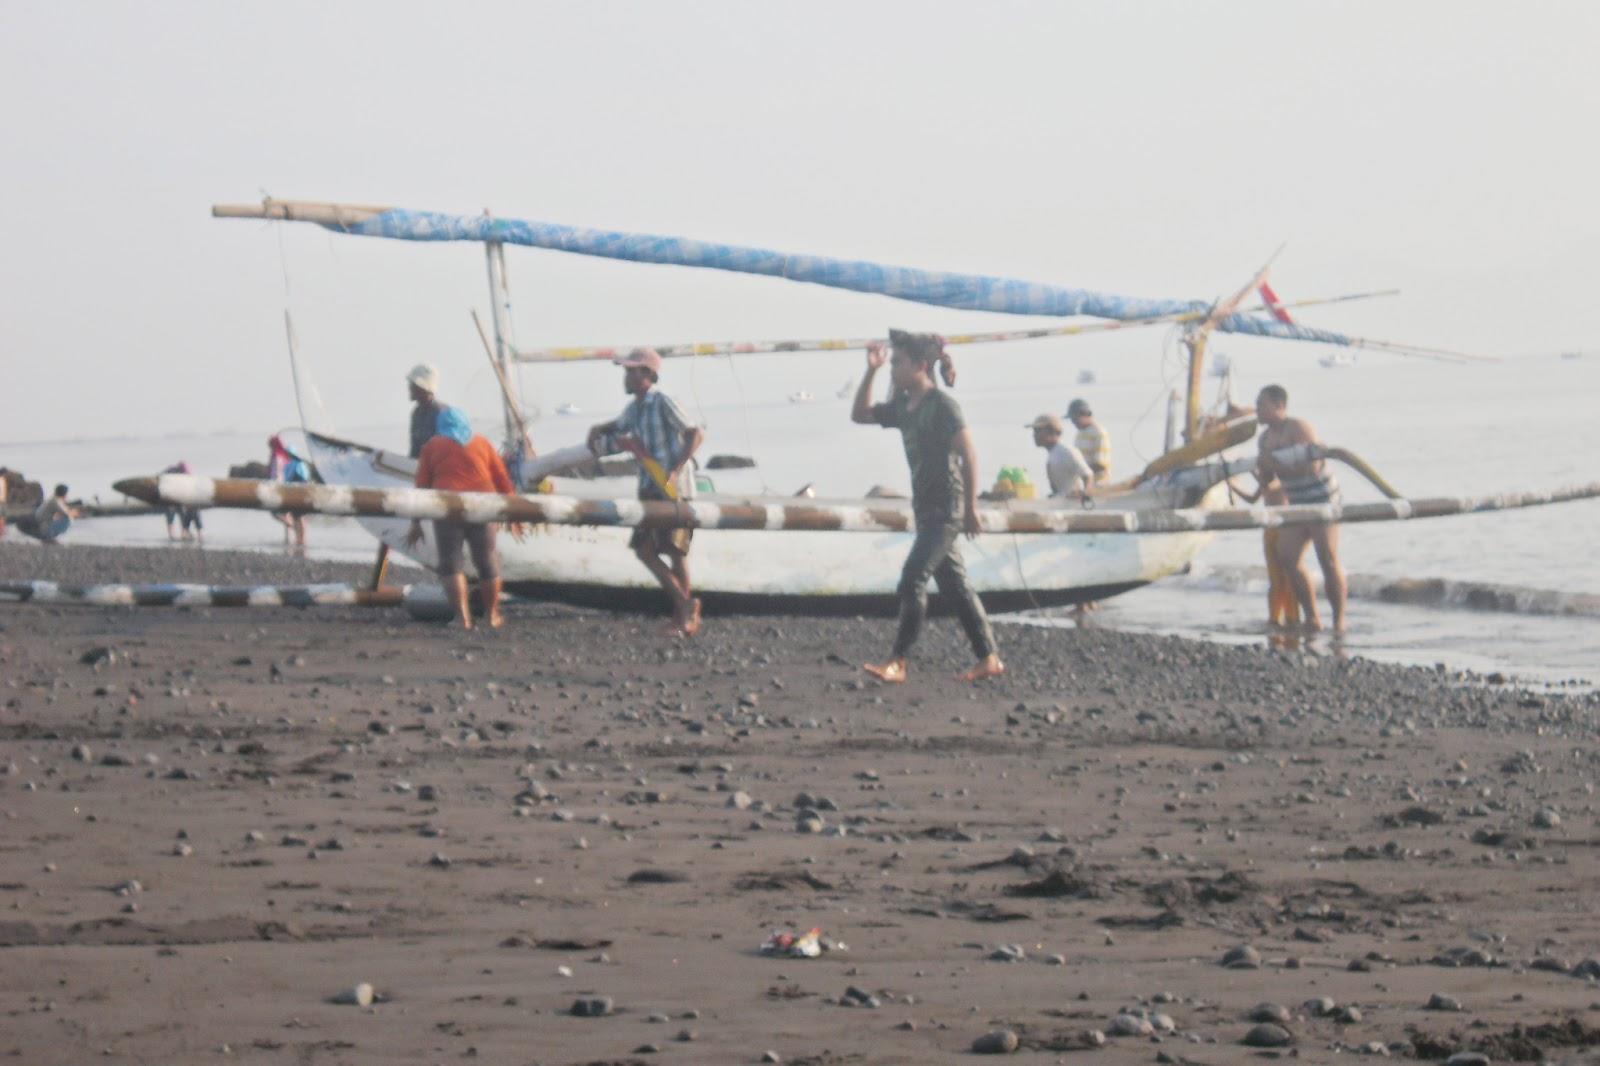 Pantai Blimbingsari Alibenel2013 Kode Penerbangan Wilayah Banyuwangi Bww Keindahan Kab